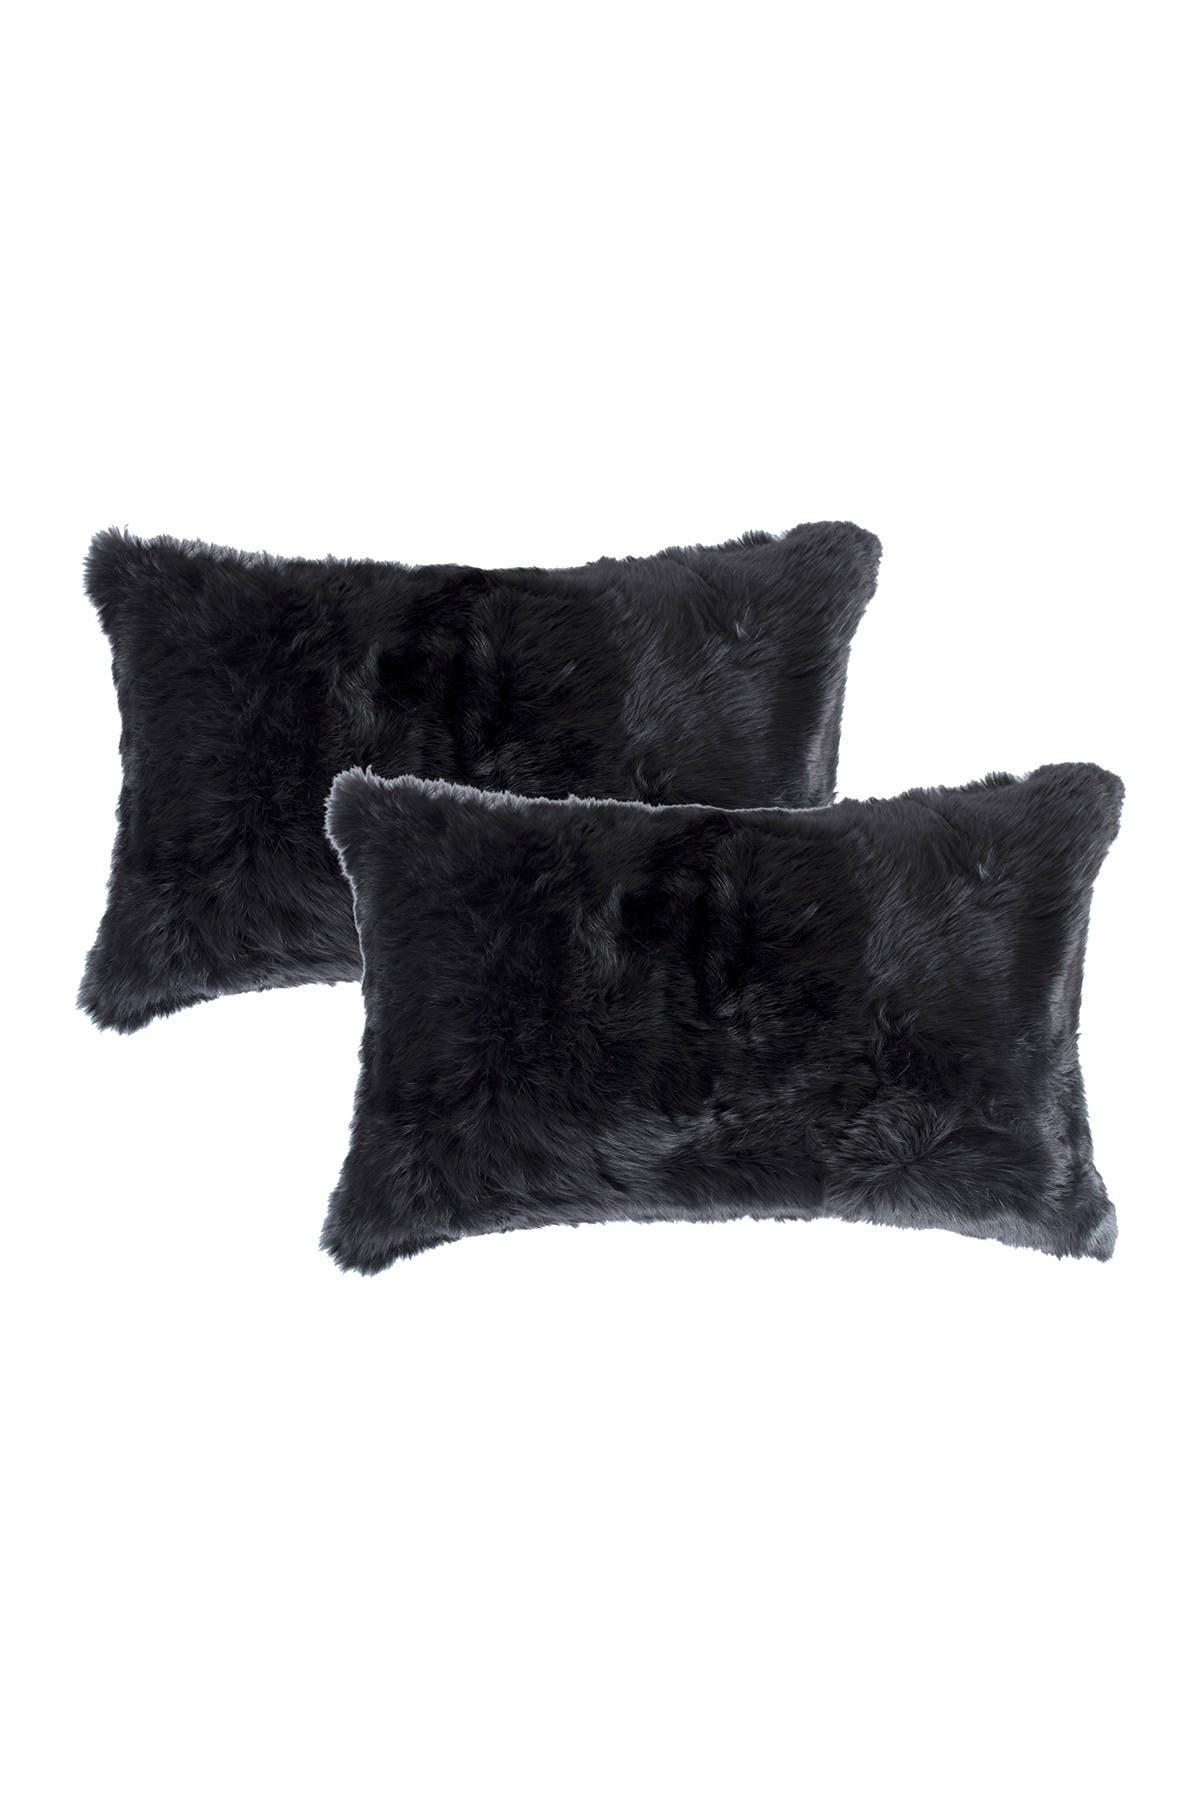 "Image of Natural Genuine Rabbit Fur Pillow - Set of 2 - 12"" x 20"" - Black"